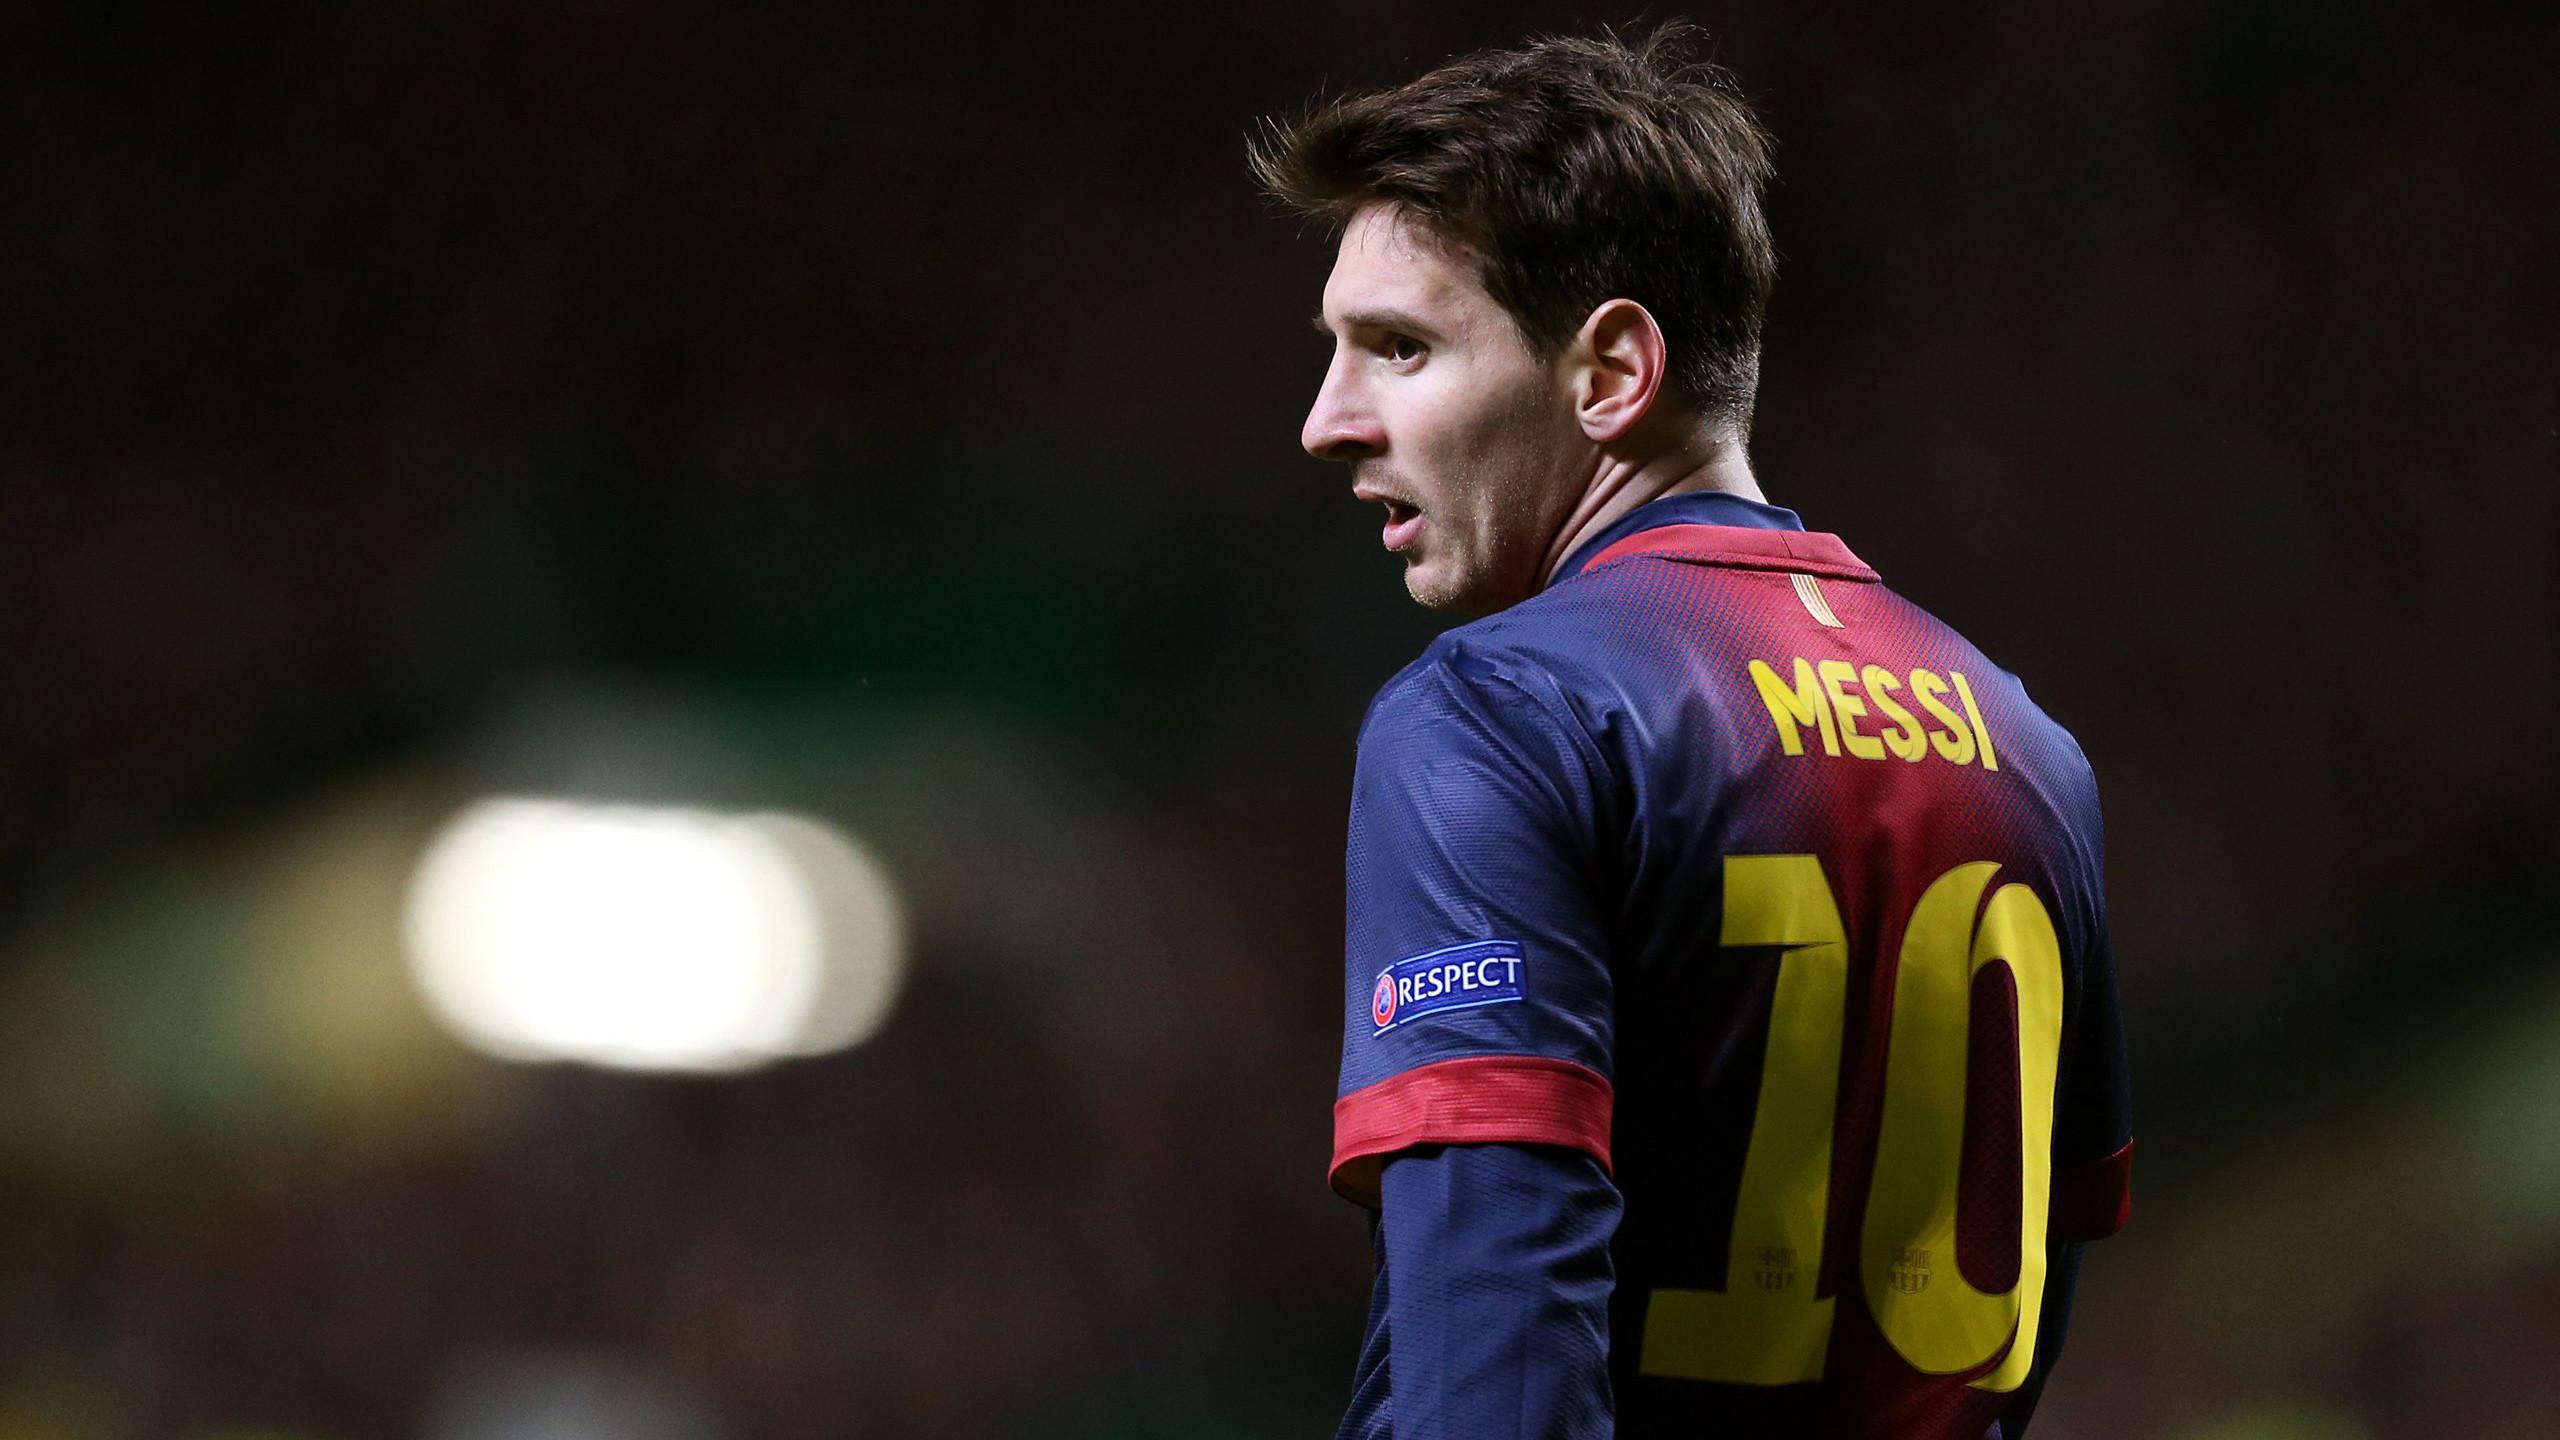 Sports / Lionel Messi Wallpaper